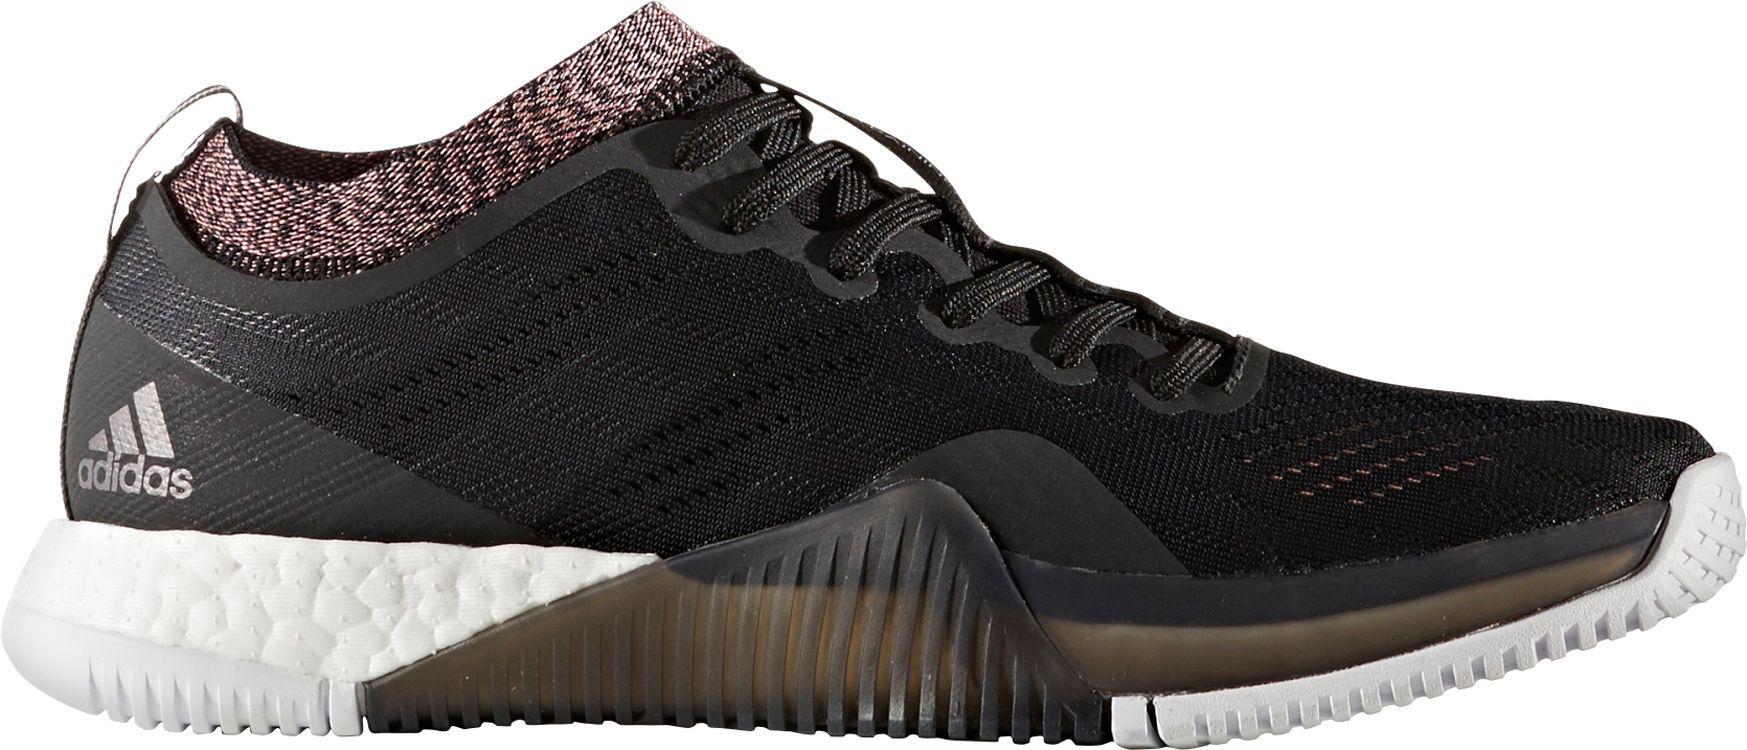 reputable site b3096 e27fa Lyst - adidas Crazytrain Elite Training Shoes in Black